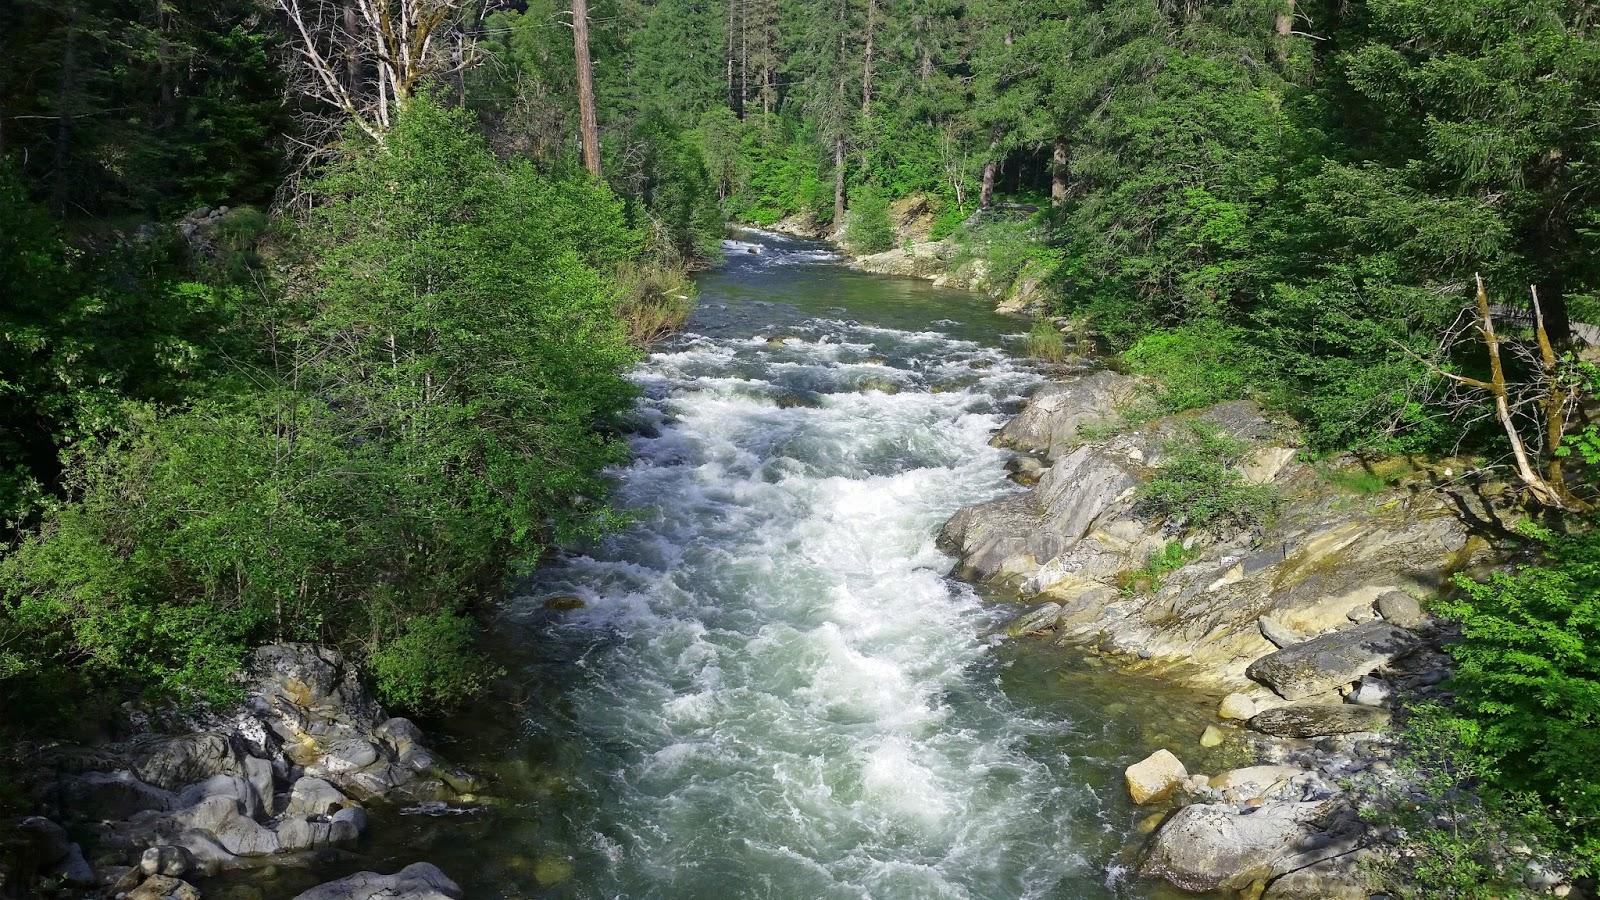 Jon baiocchi fly fishing news lake davis fishing report 5 for Feather river fishing